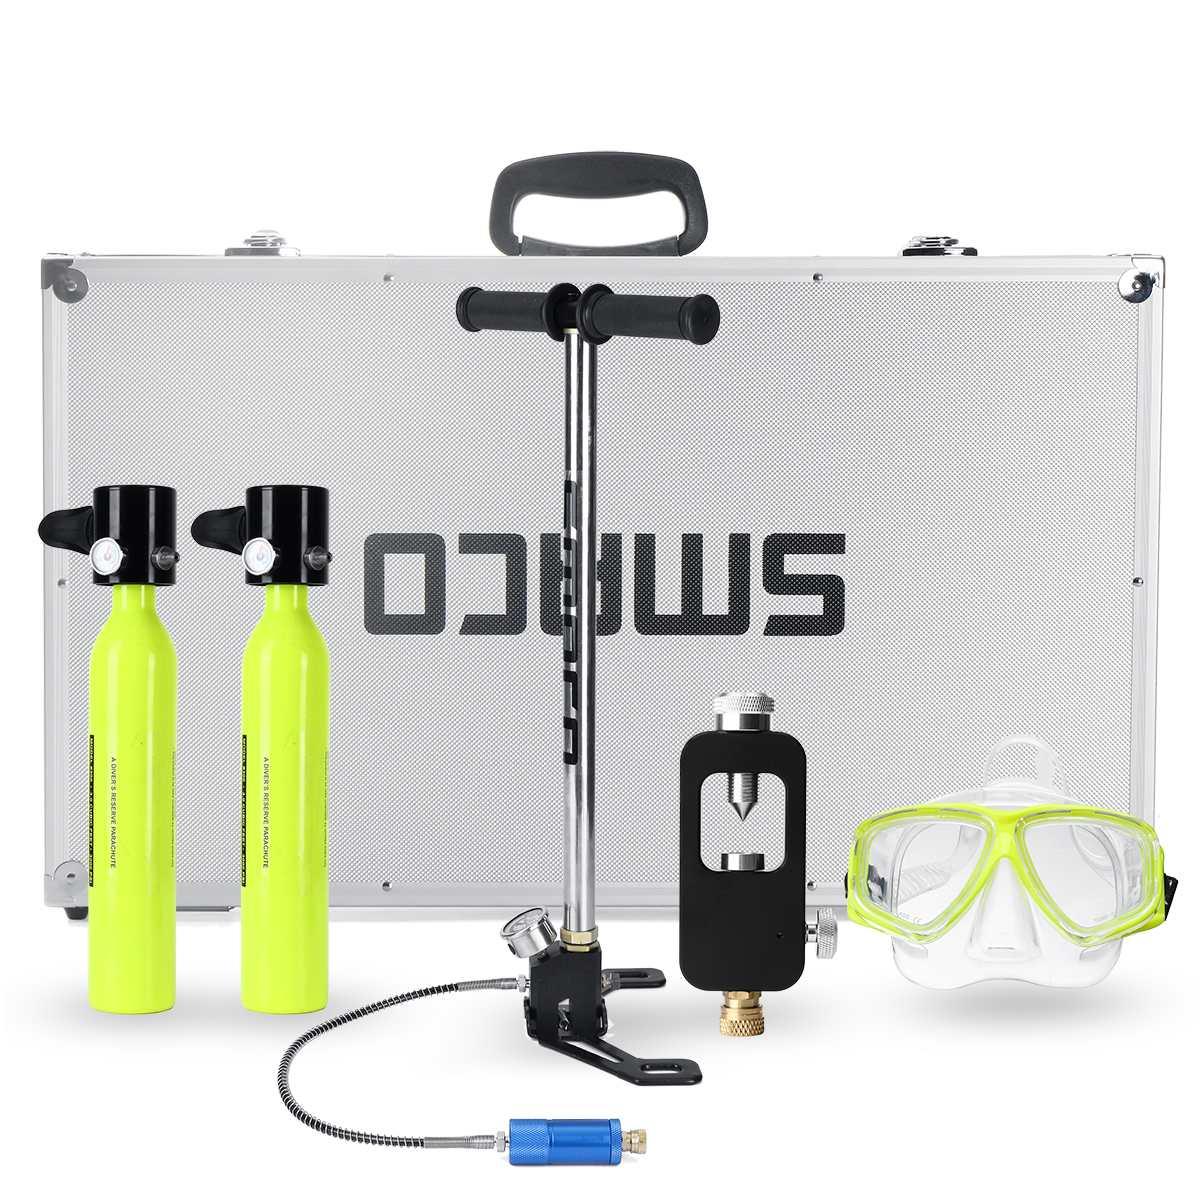 2 Tanks Set Mini Diving Scuba Cylinder Air Tank Valve Respirator Box Diving Equipment Snorkeling Underwater Breathing